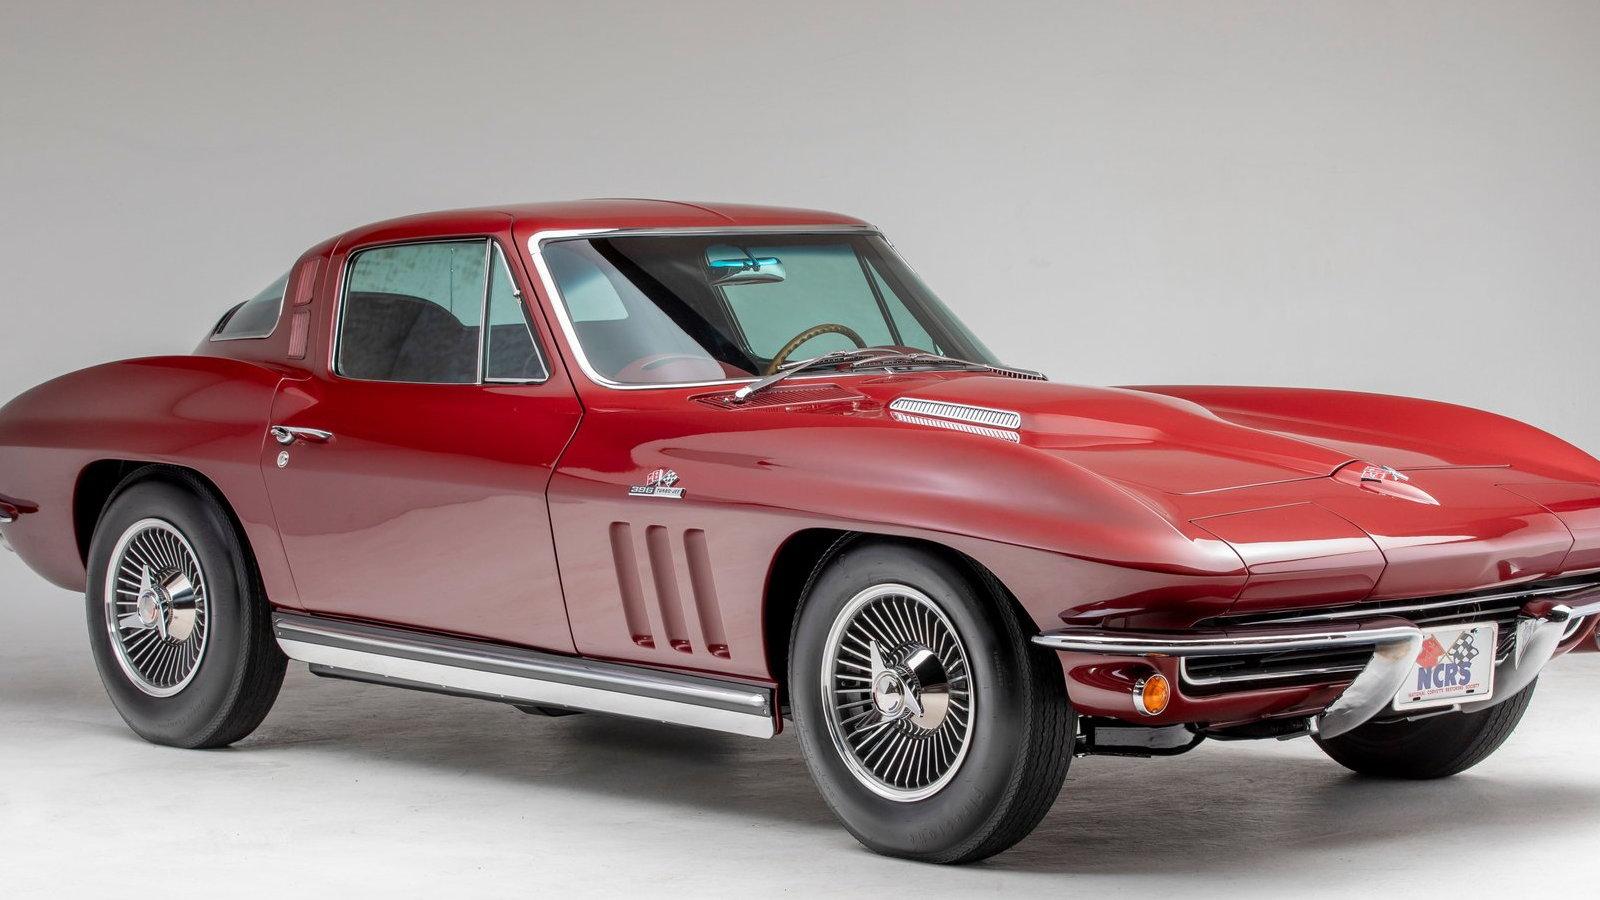 Restored 1965 Milano Maroon Corvette Stuns